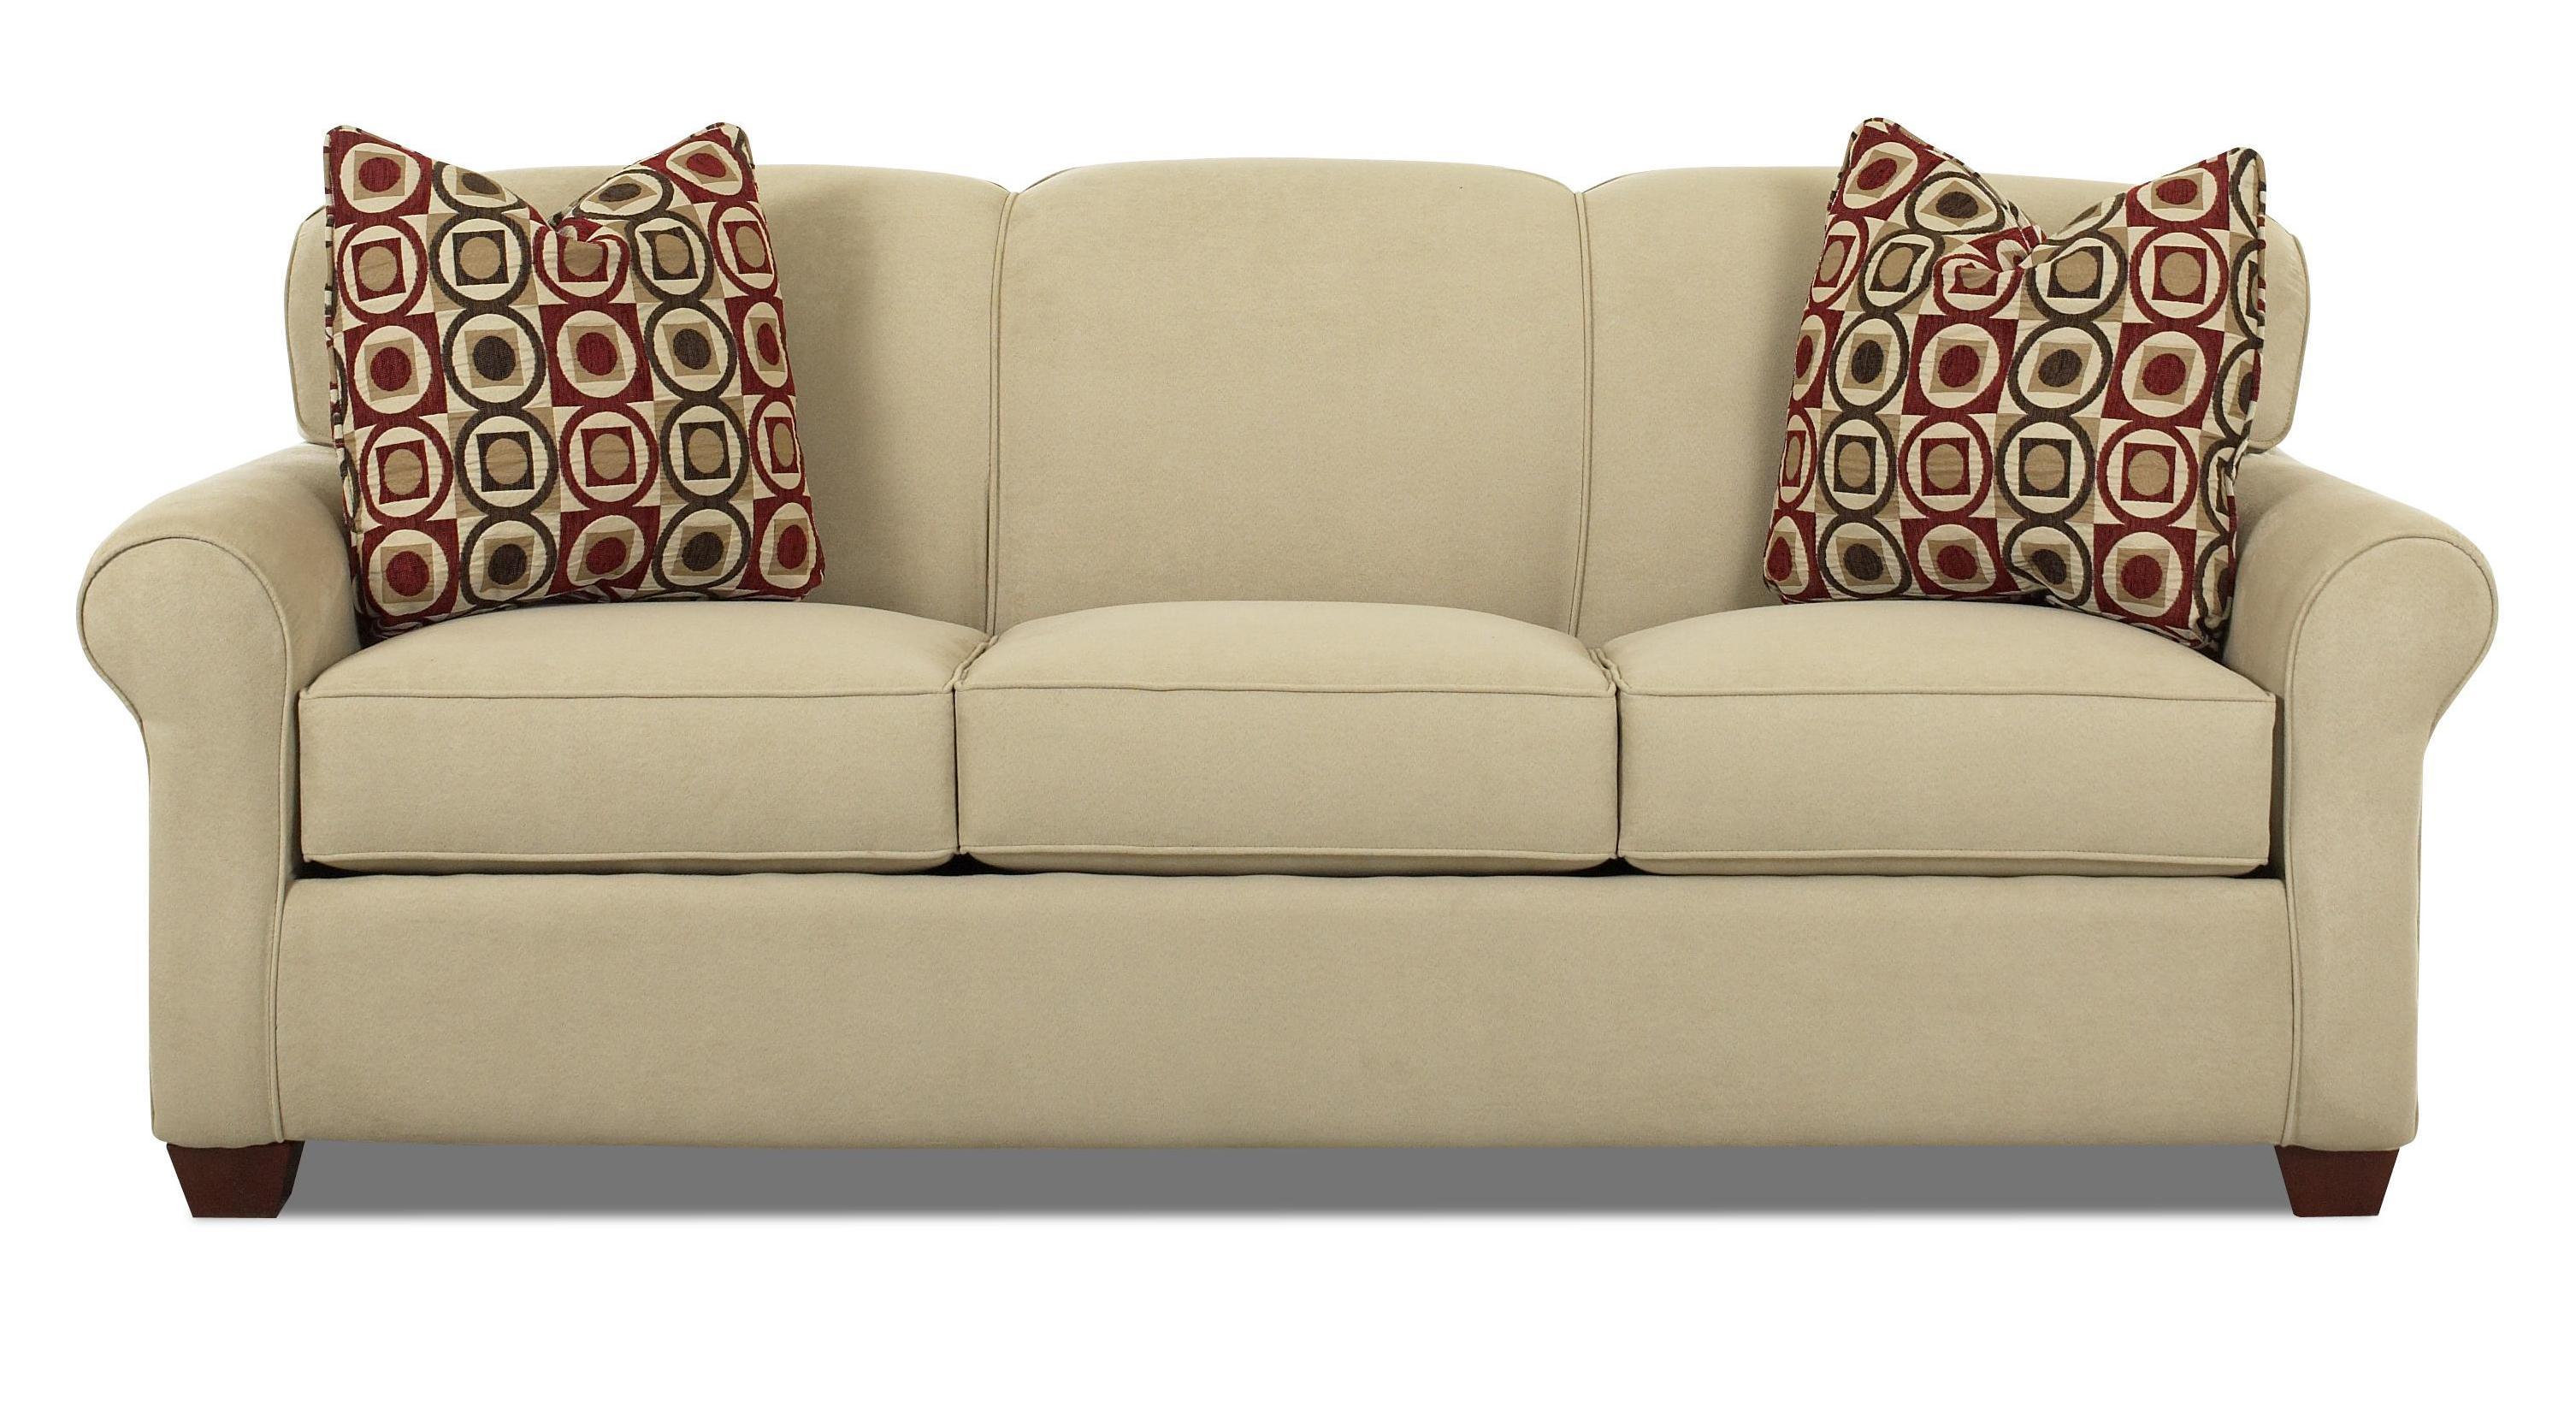 Mayhew Stationary Sofa by Klaussner at Johnny Janosik